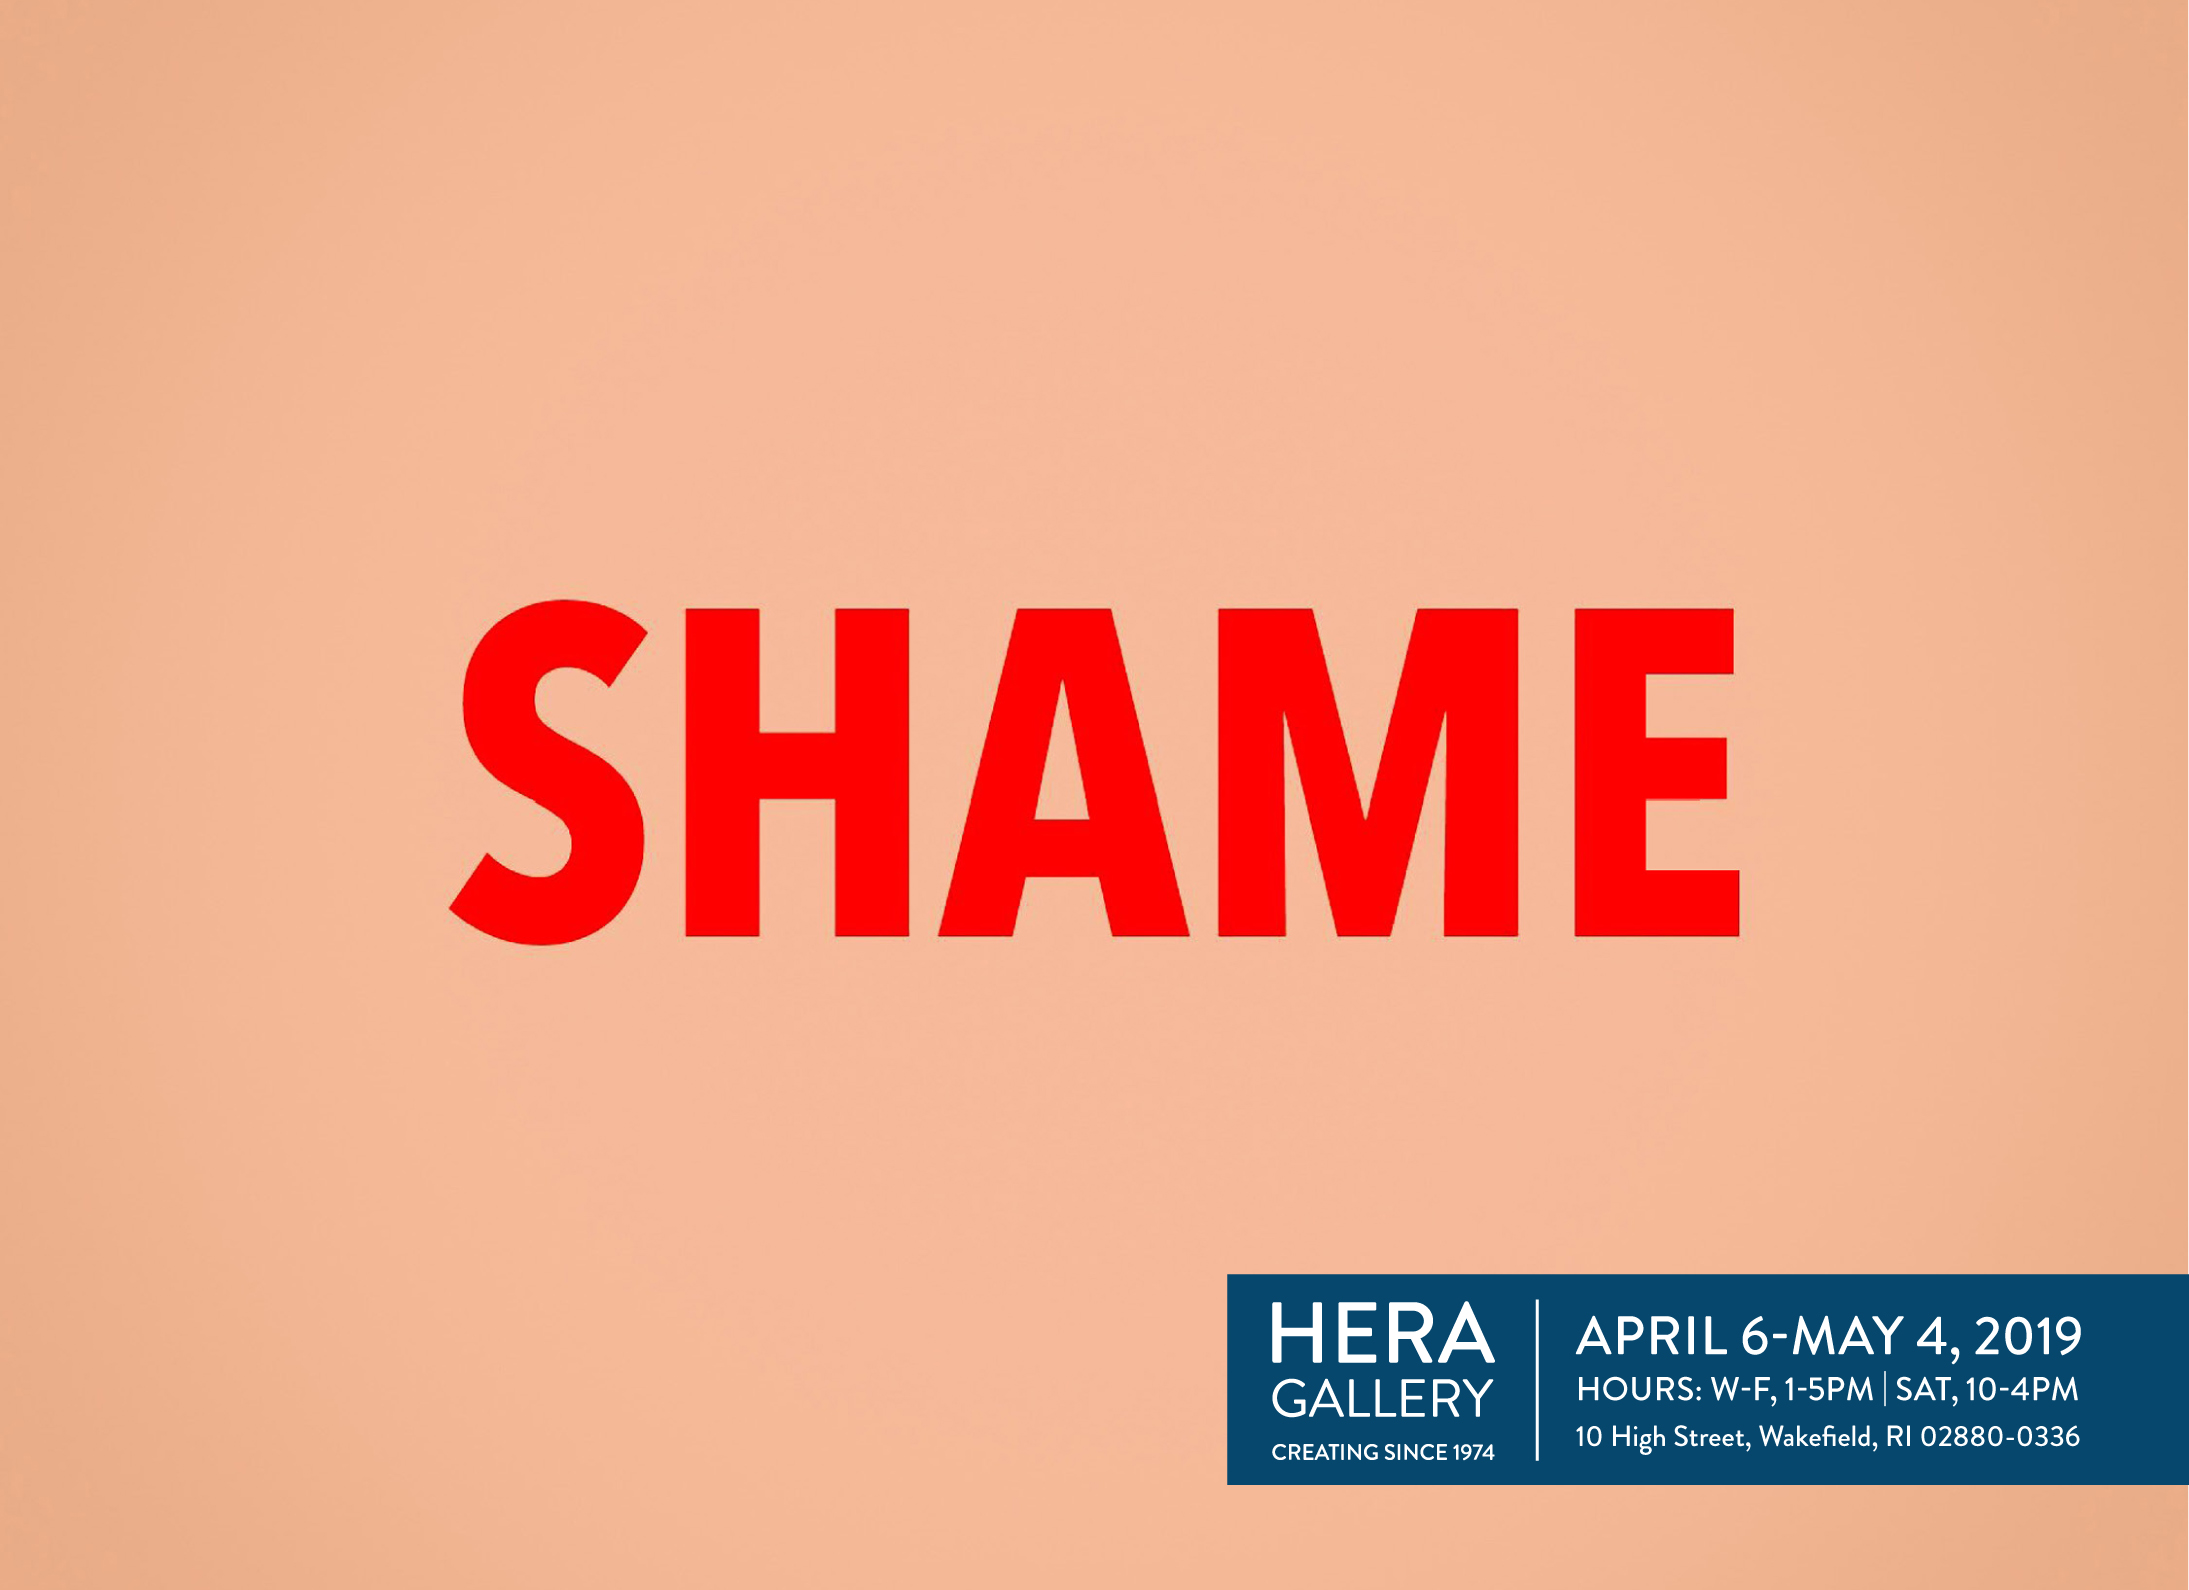 Hera_Gallery_Showcard_Shame_03_FRONT.jpg